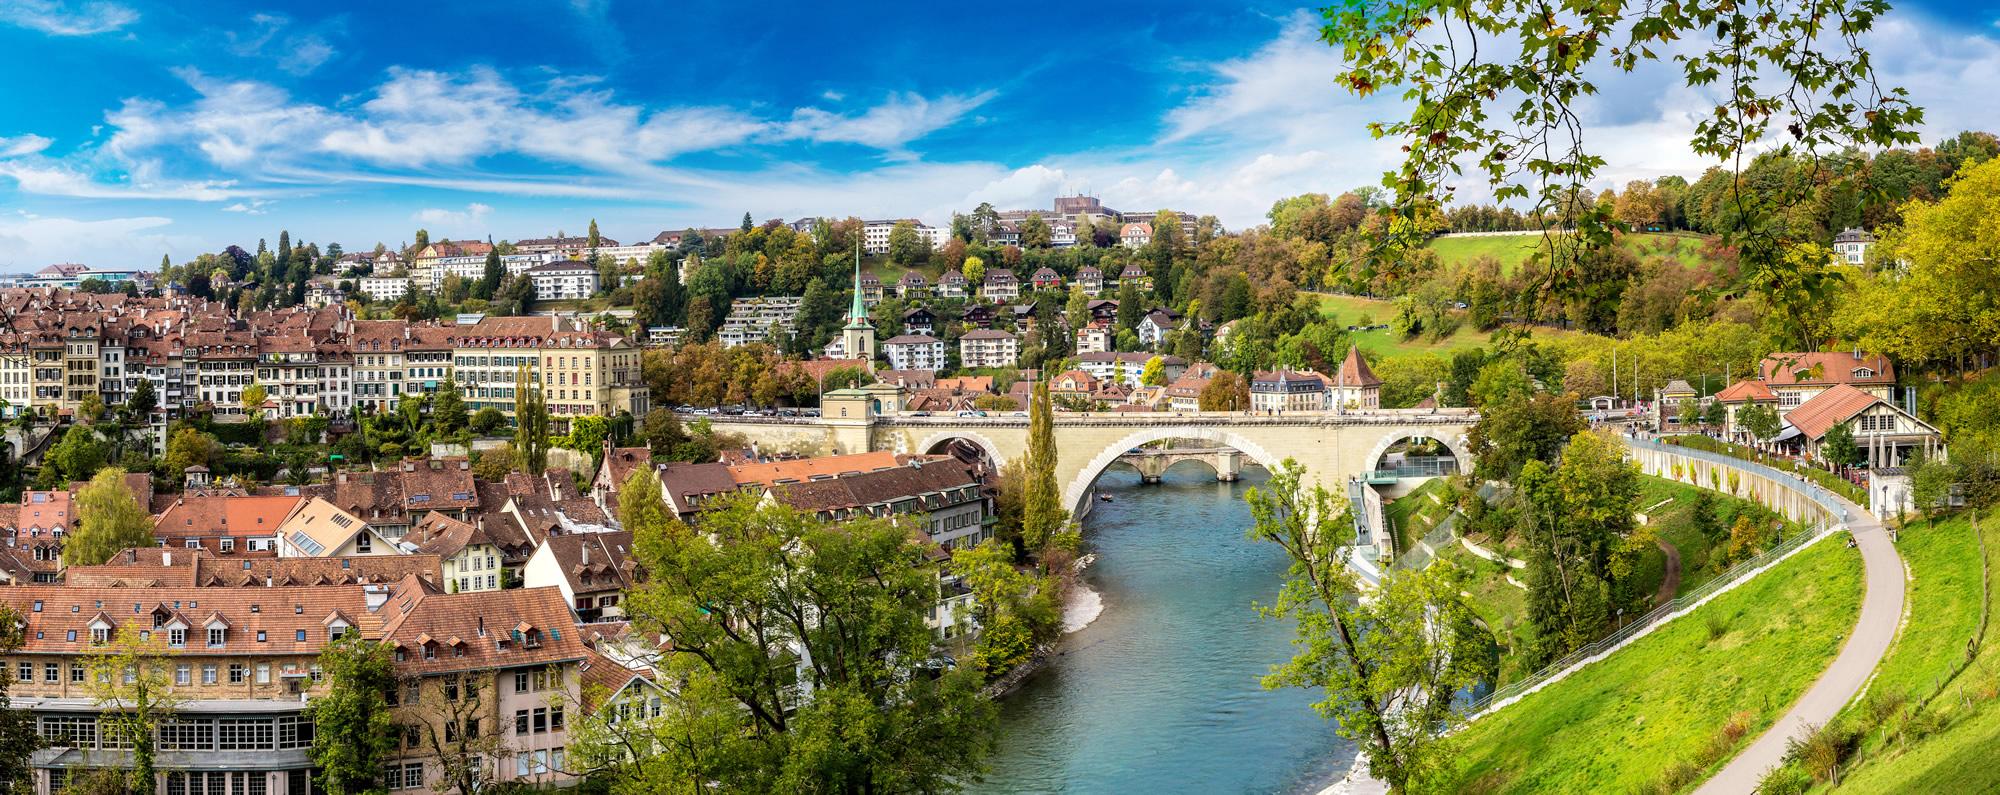 LavauxBern Switzerland